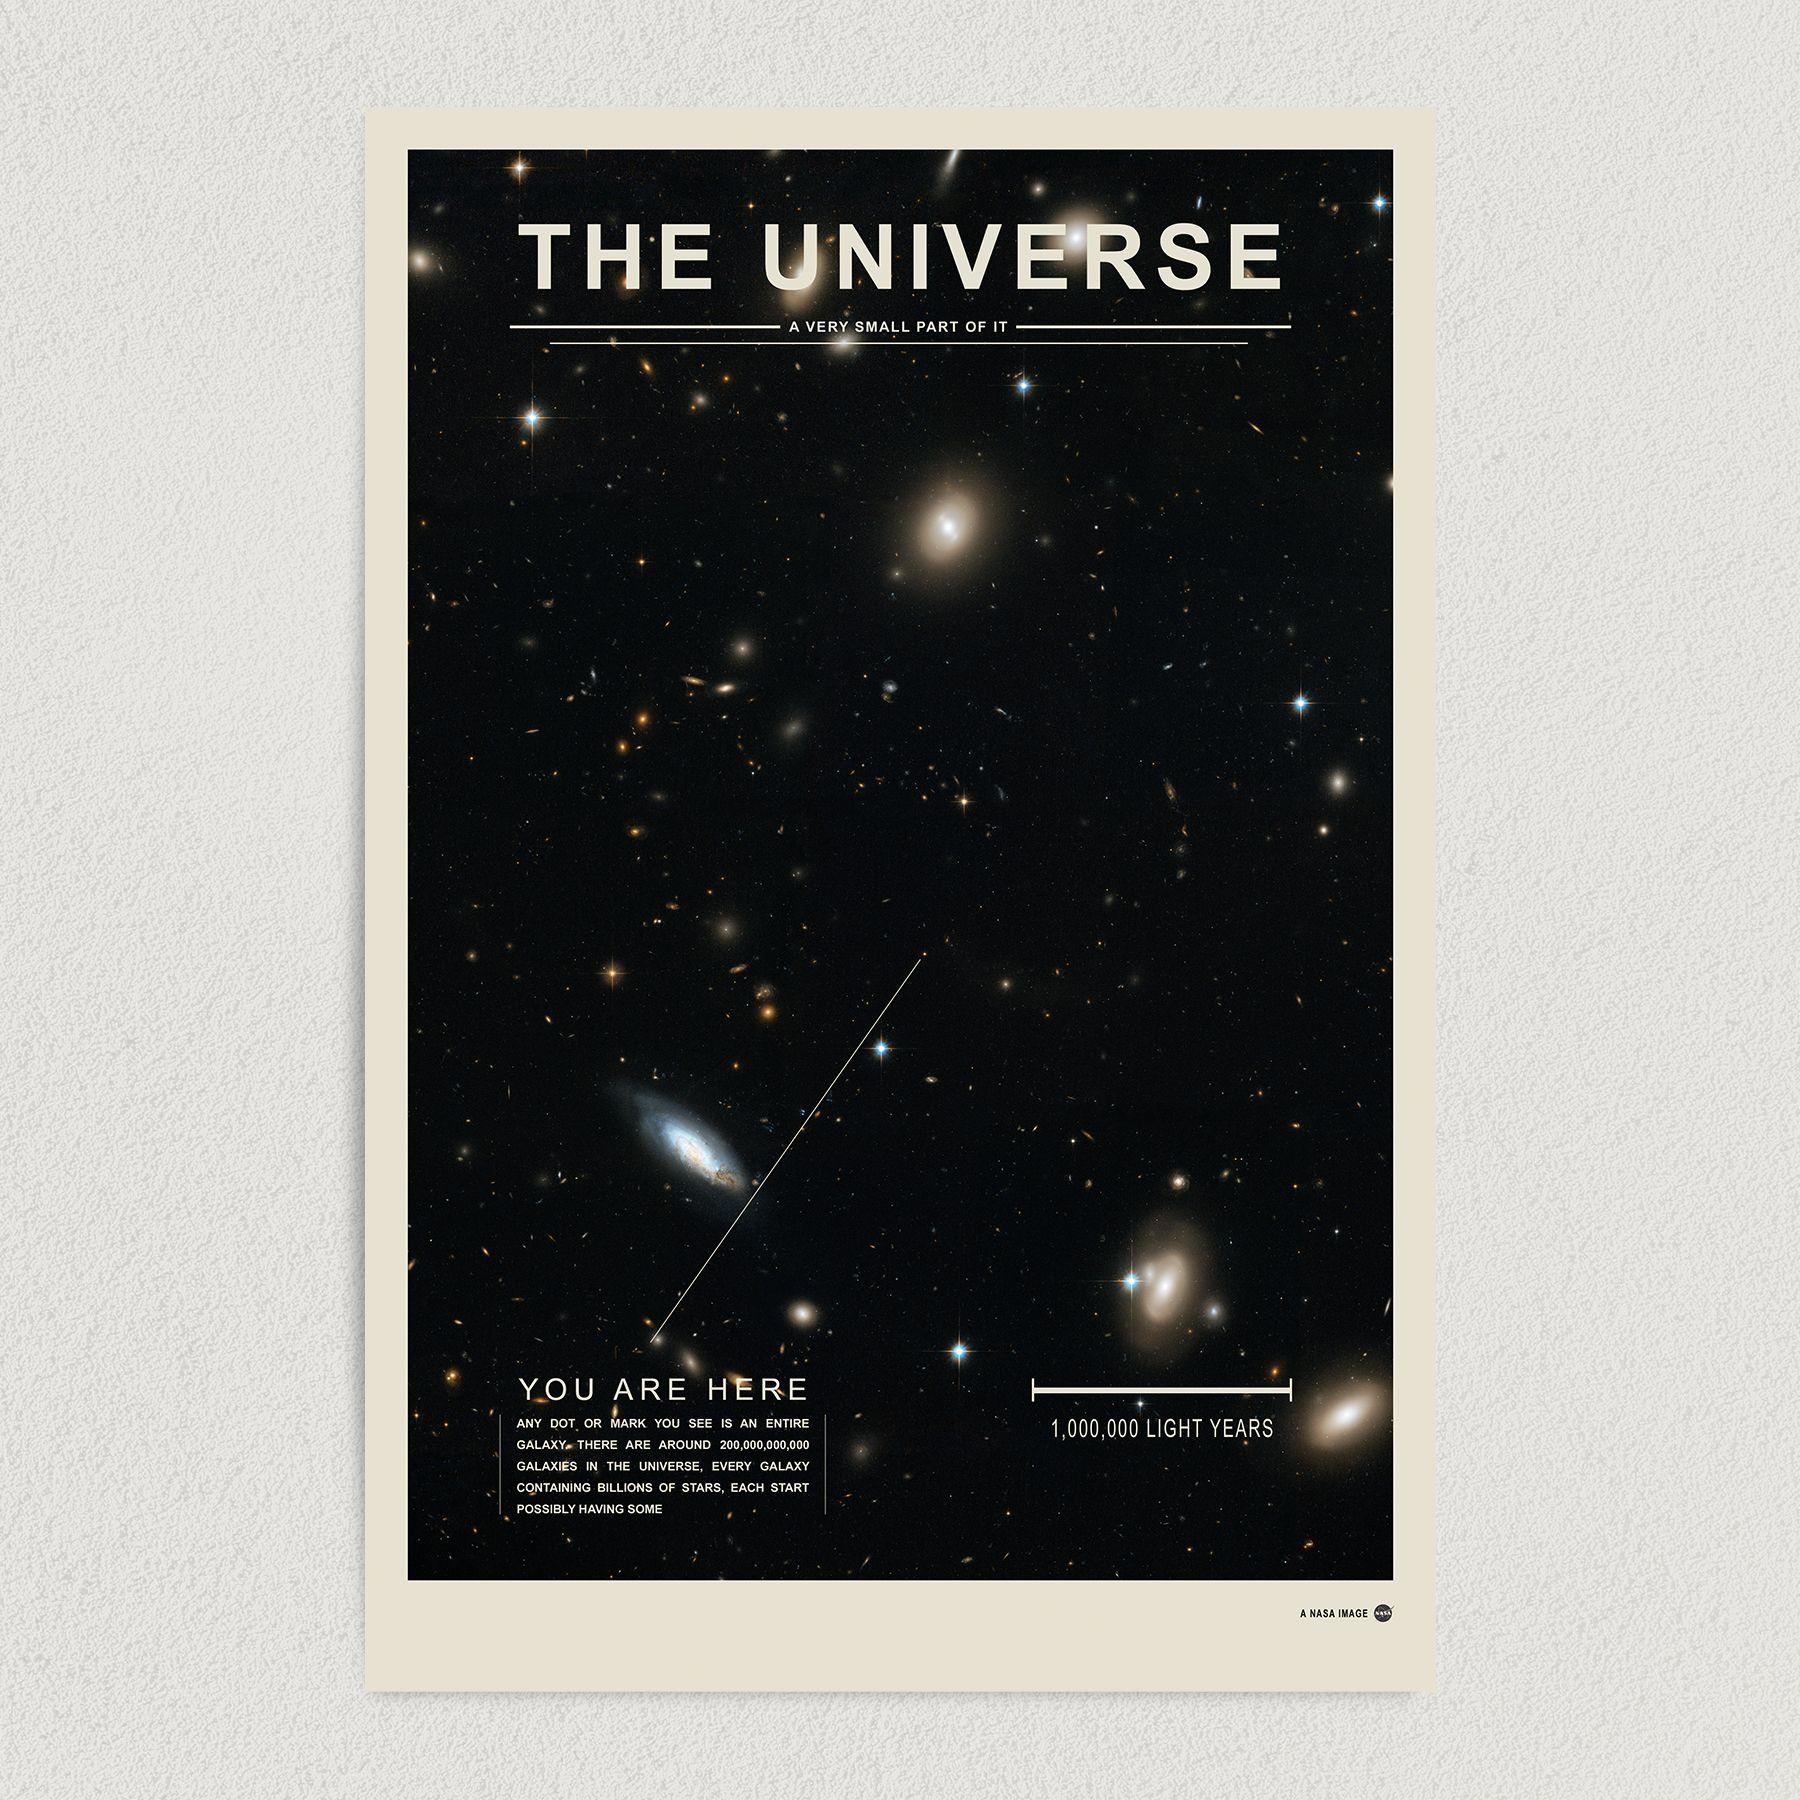 The Universe NASA Art Print Poster 12″ x 18″ Wall Art s3310